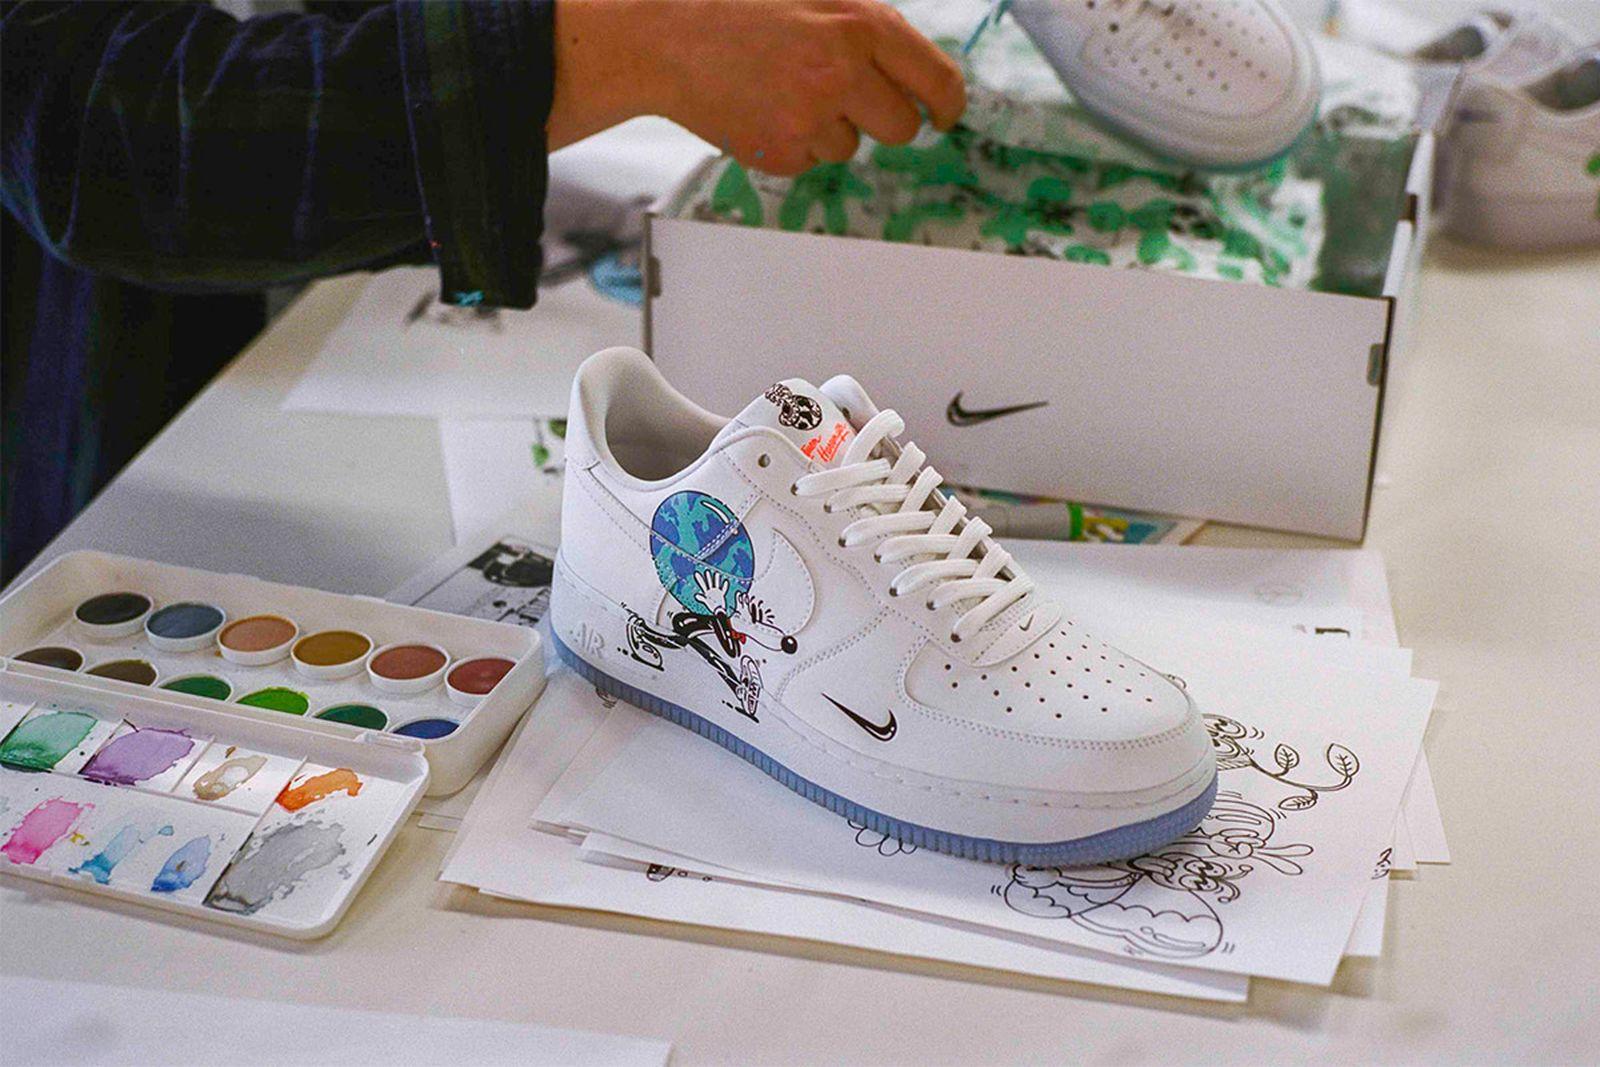 jurado salado Cien años  The Steven Harrington x Nike Flyleather Collection Is Sustainable